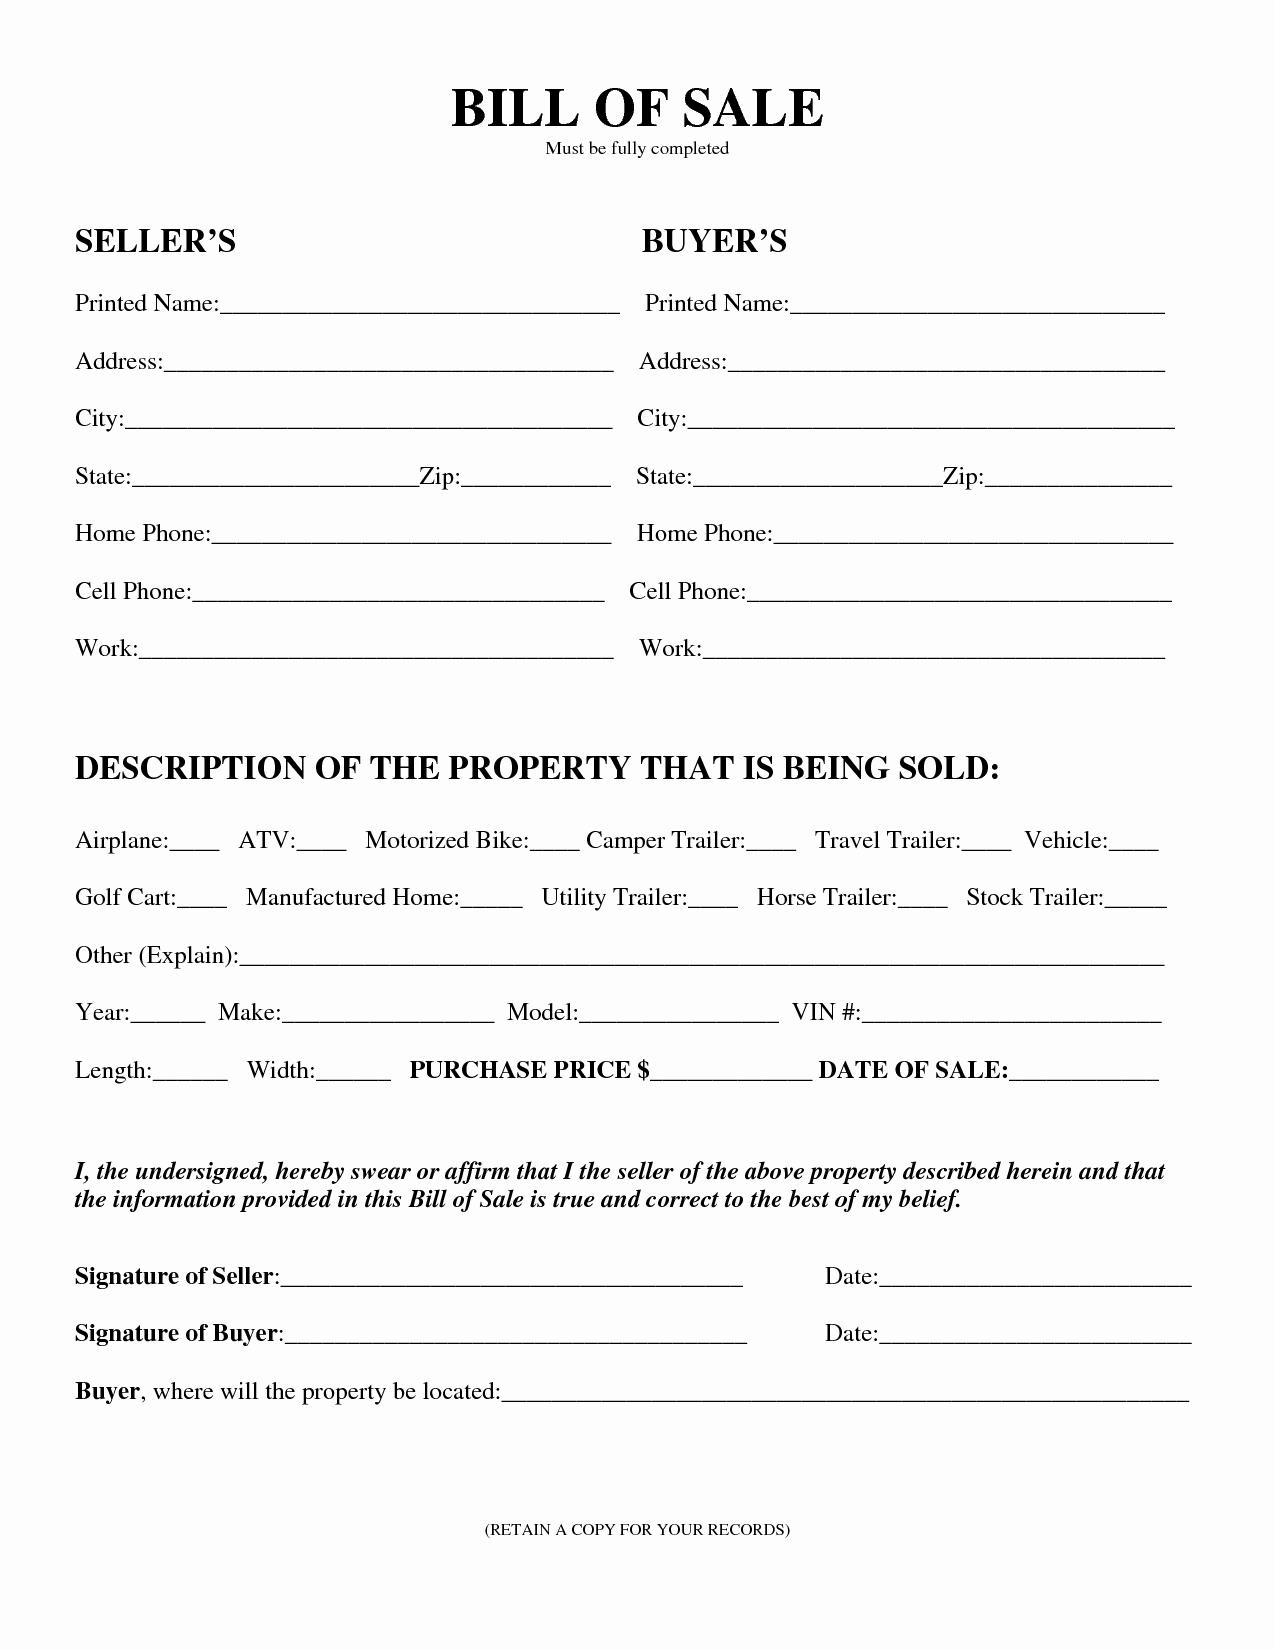 Bill Of Sale form Pdf Elegant Download Bill Sale forms – Pdf & Image